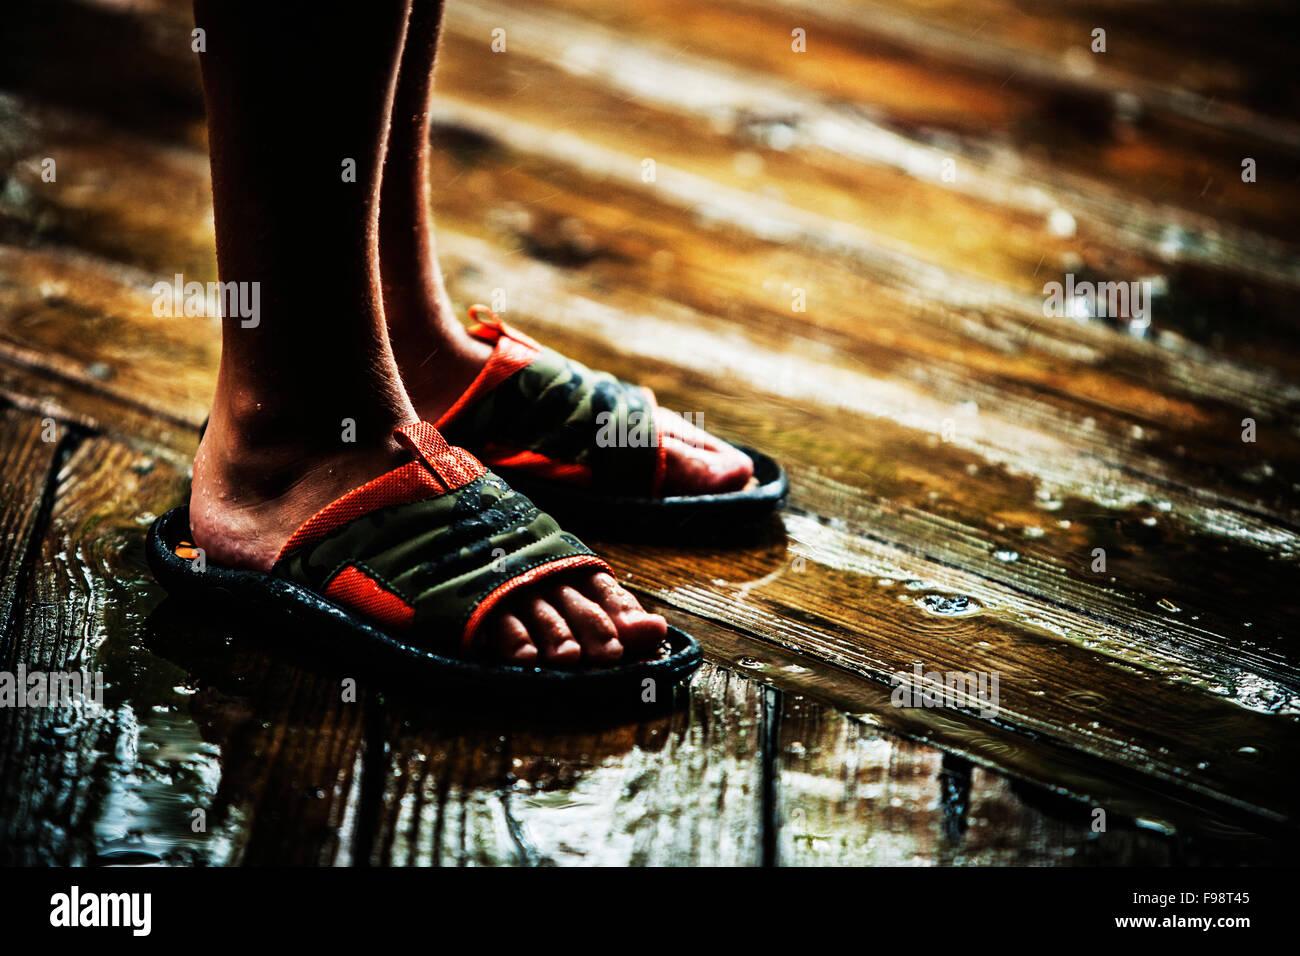 A Feet Photo91778293 Boys Sandals In Alamy Wet Stock othdCxsQBr